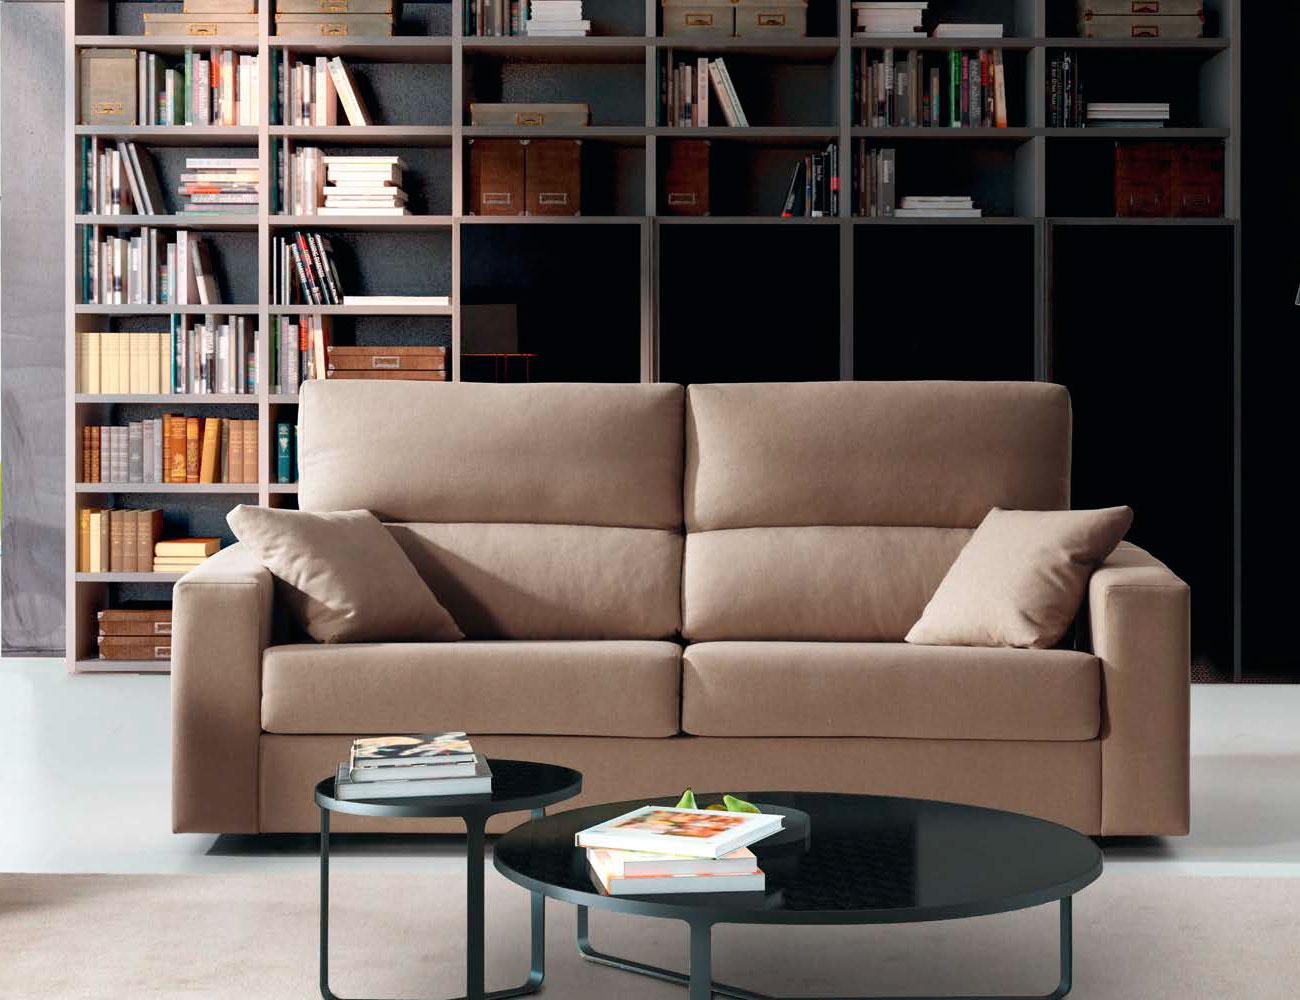 Sofas cama apertura italiana baratos